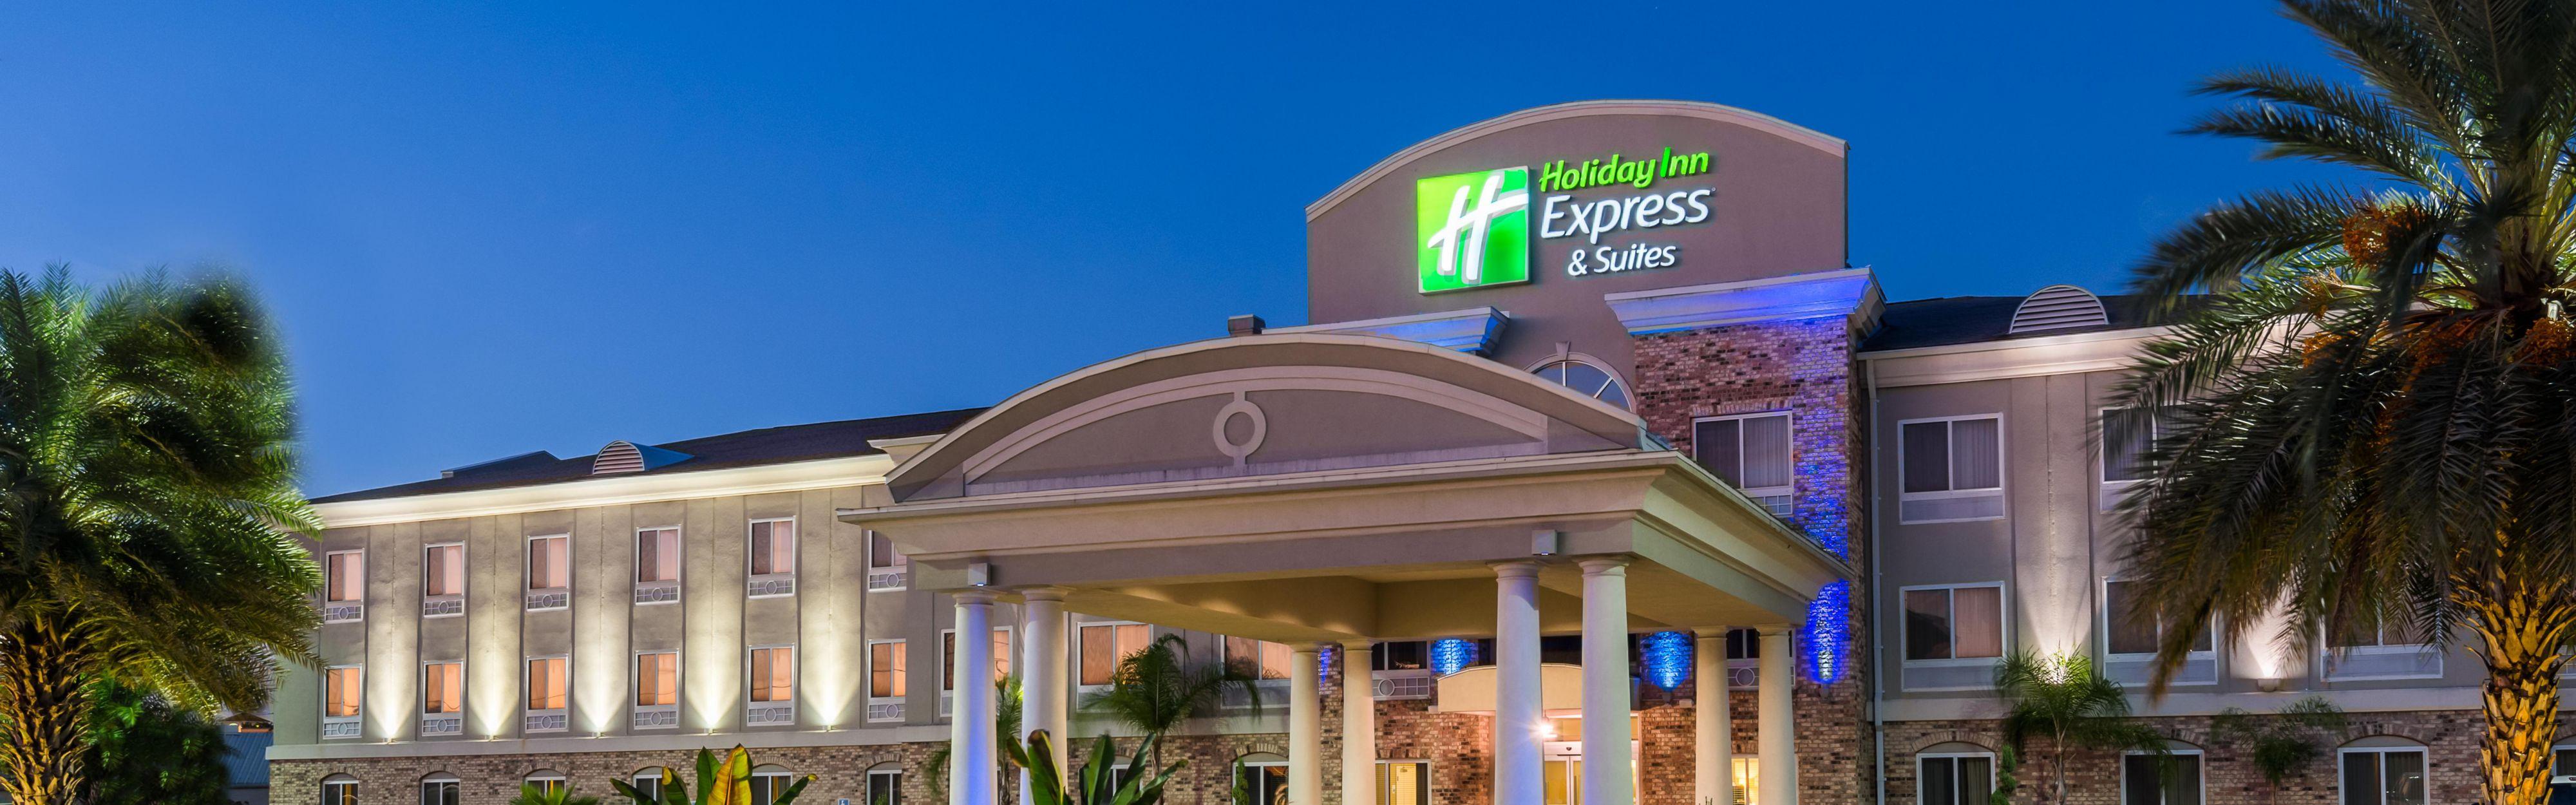 Holiday Inn Express & Suites New Iberia-Avery Island image 0